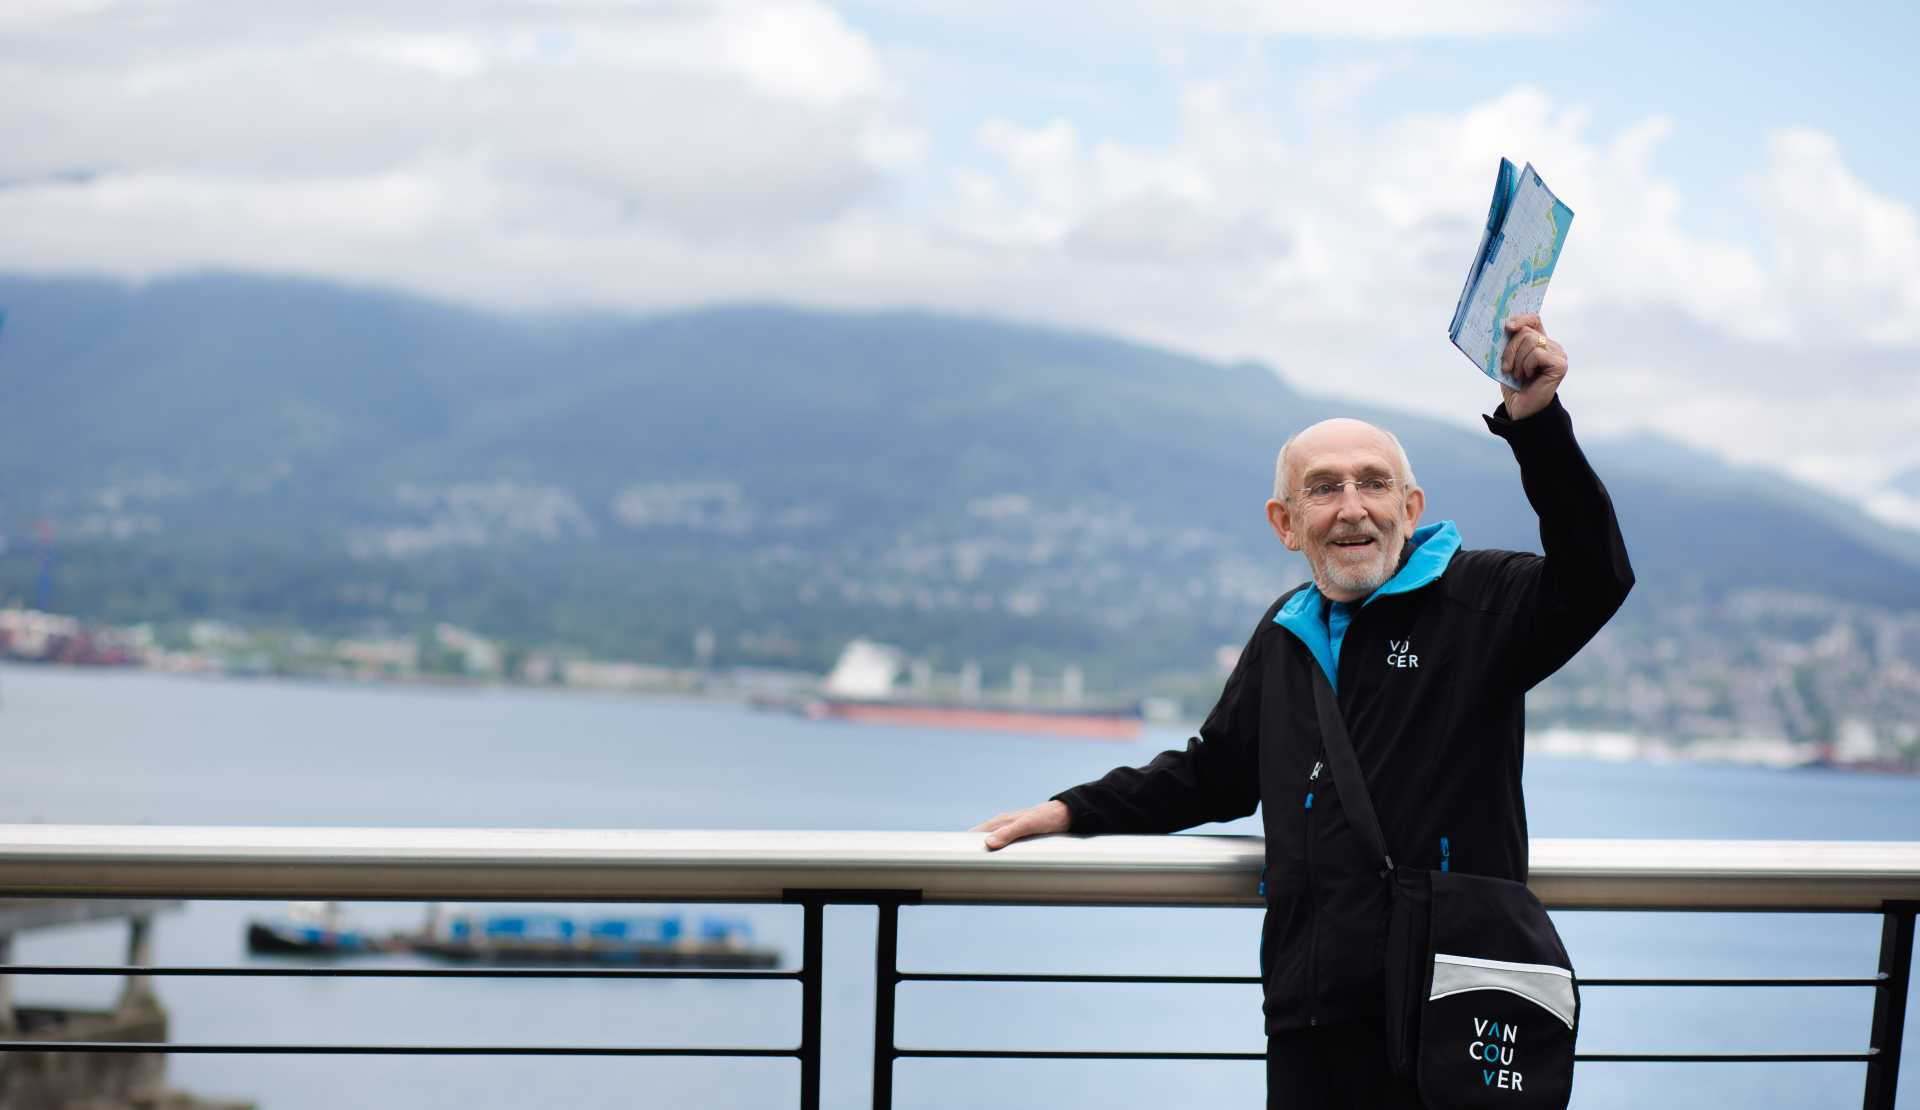 Tourism Vancouver Volunteer